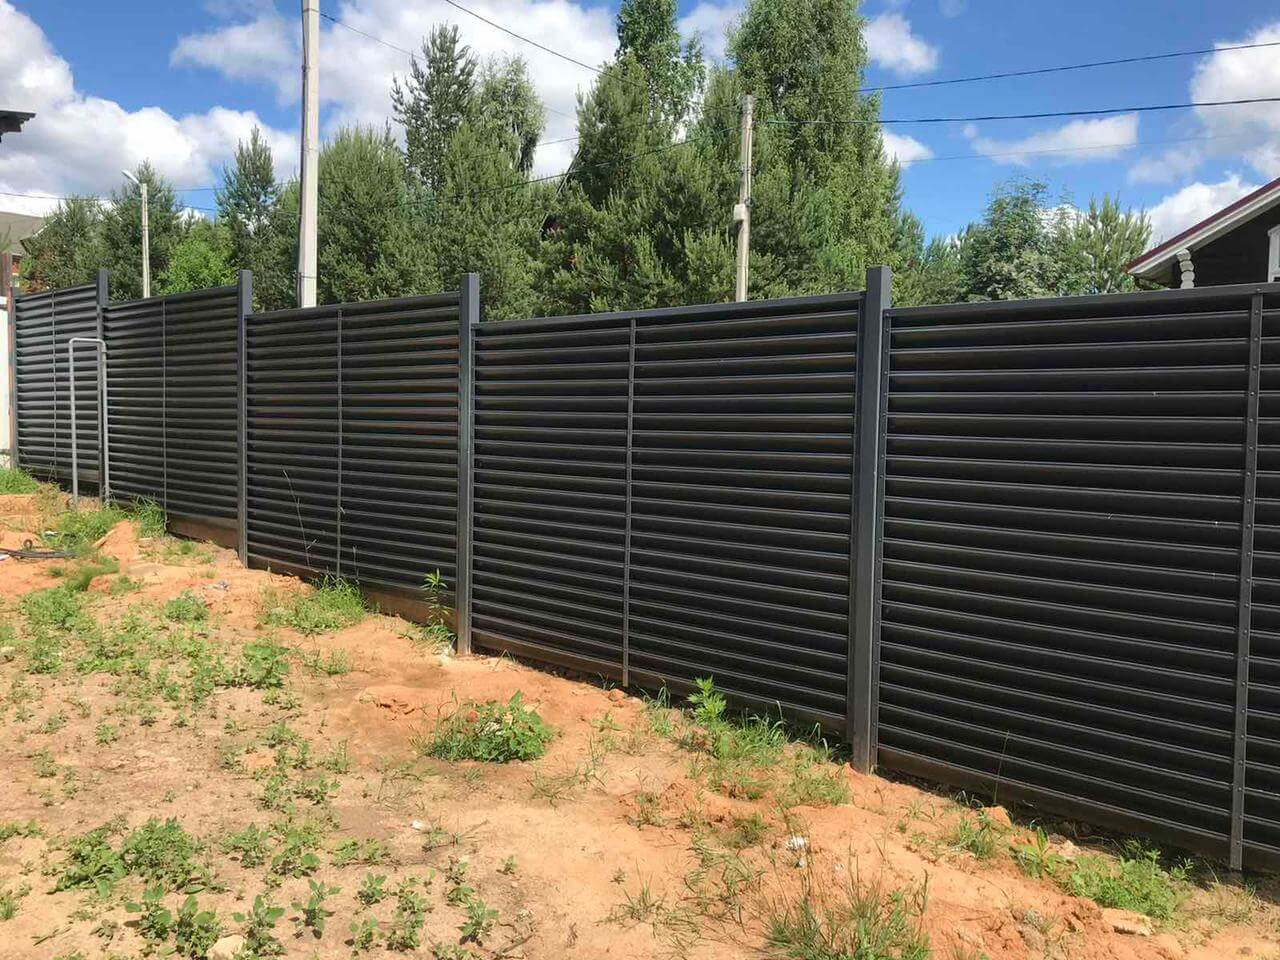 забор-жалюзи ЭКО-Z серый графит фото3